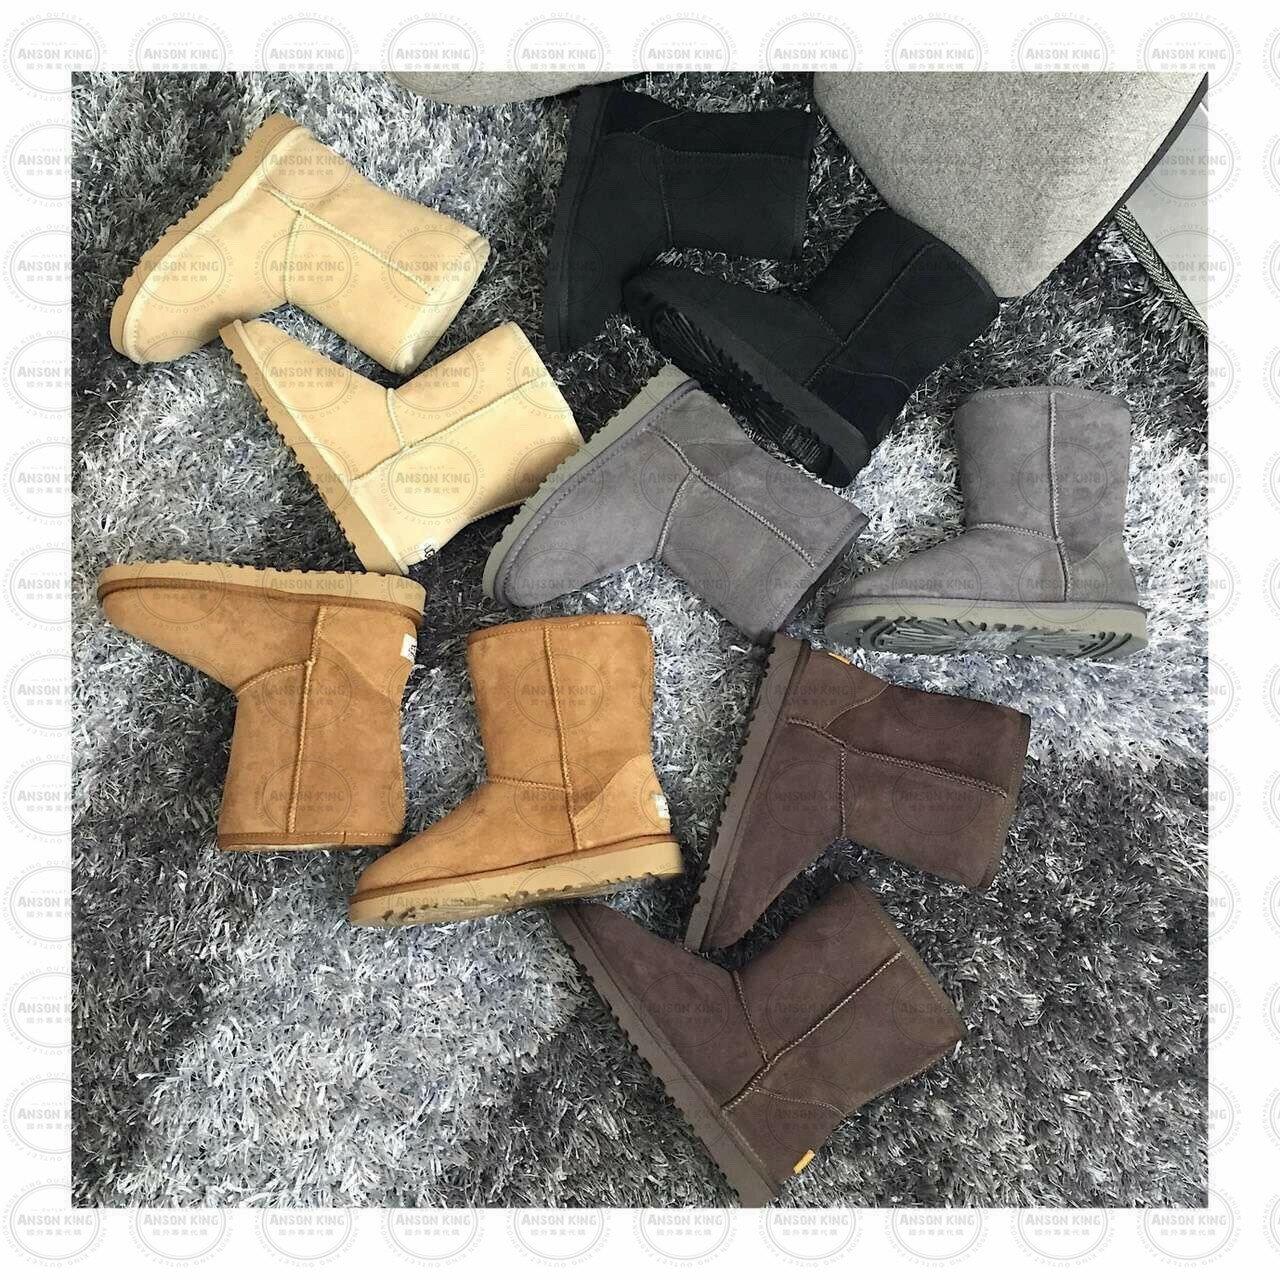 OUTLET正品代購 澳洲 UGG 經典女款羊皮毛一體雪靴 短靴 保暖 真皮羊皮毛 雪靴 短靴 黑色 2